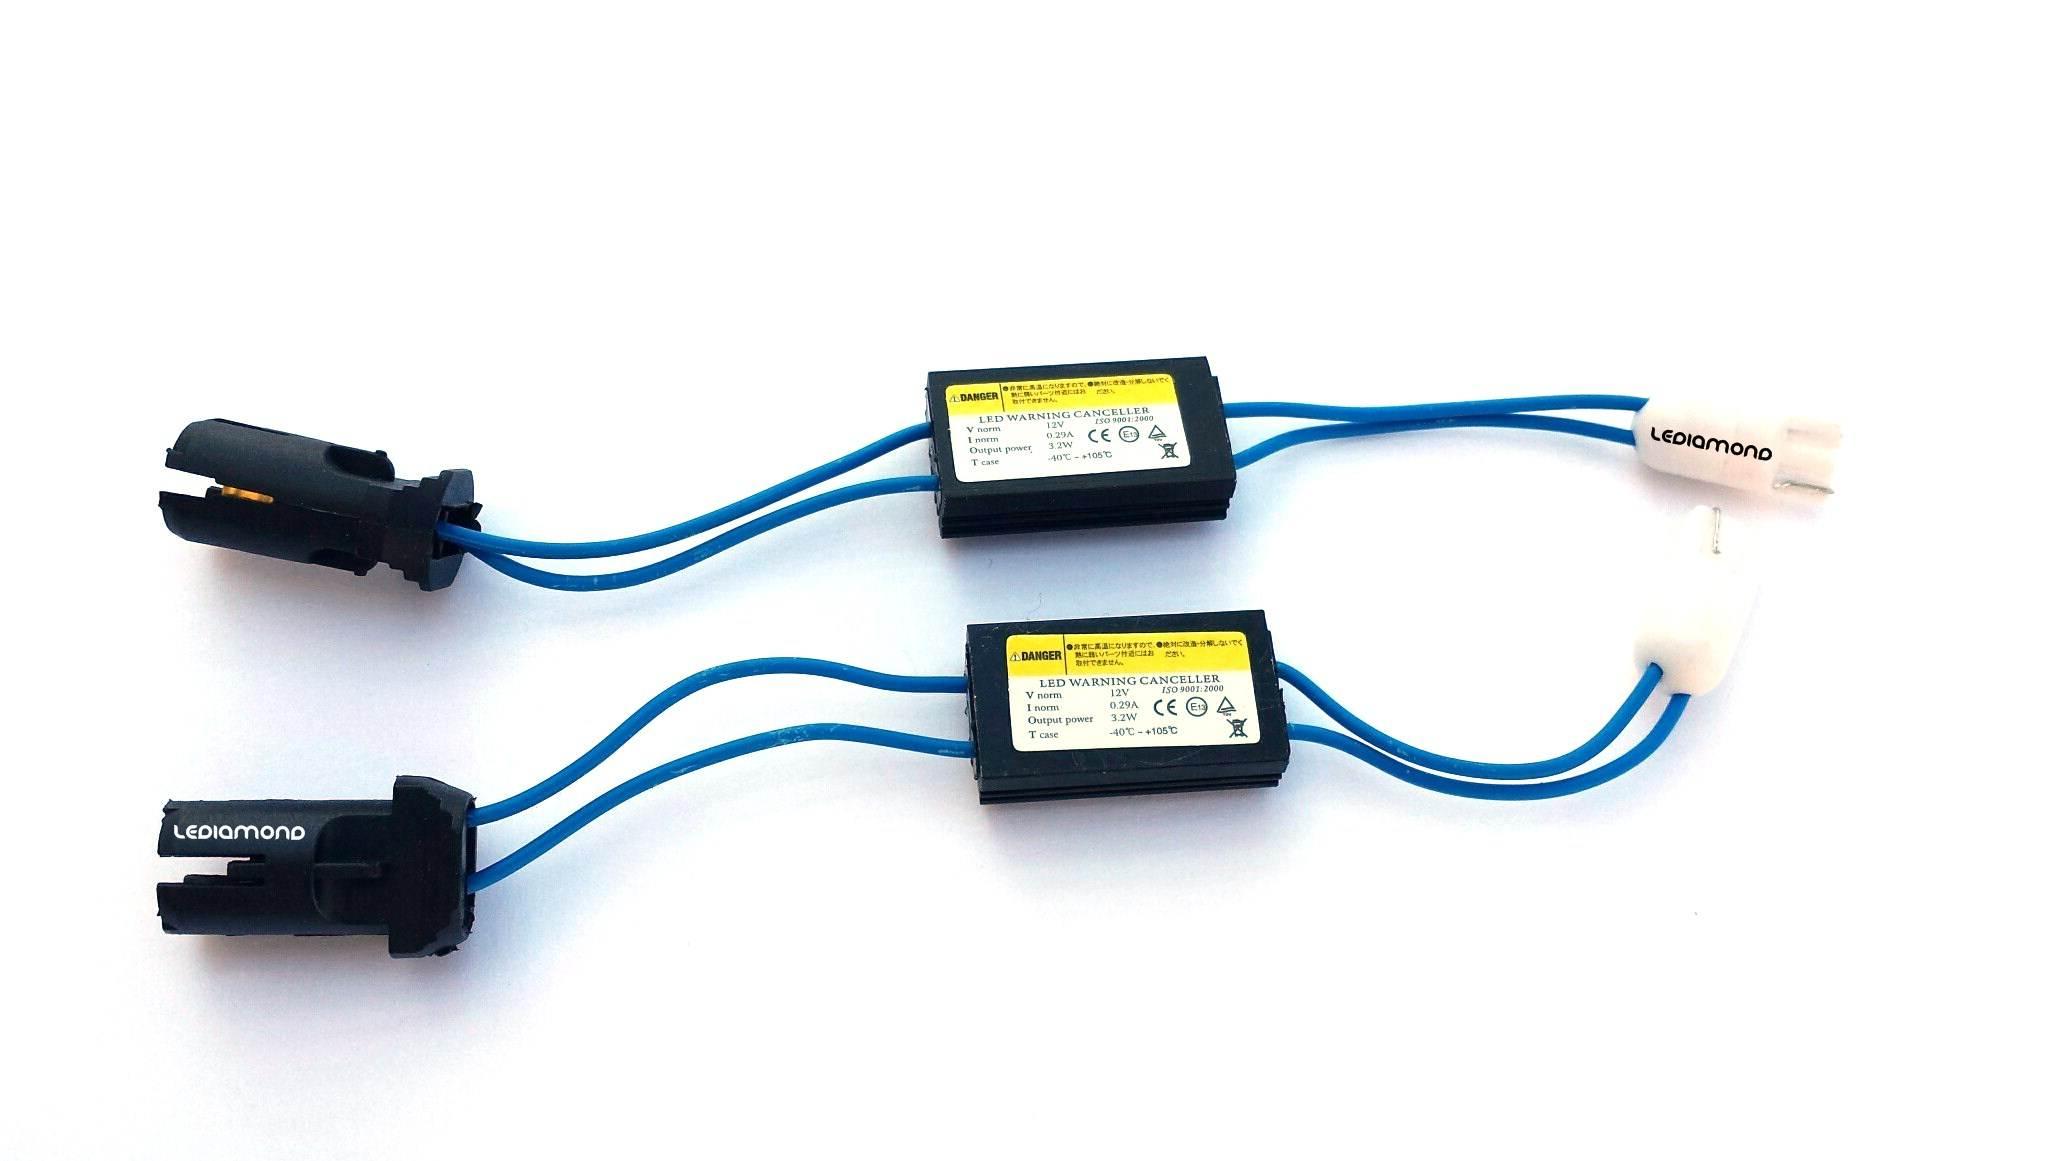 KIT CANBUS LEDIAMOND 5W CON CONECTORES T10